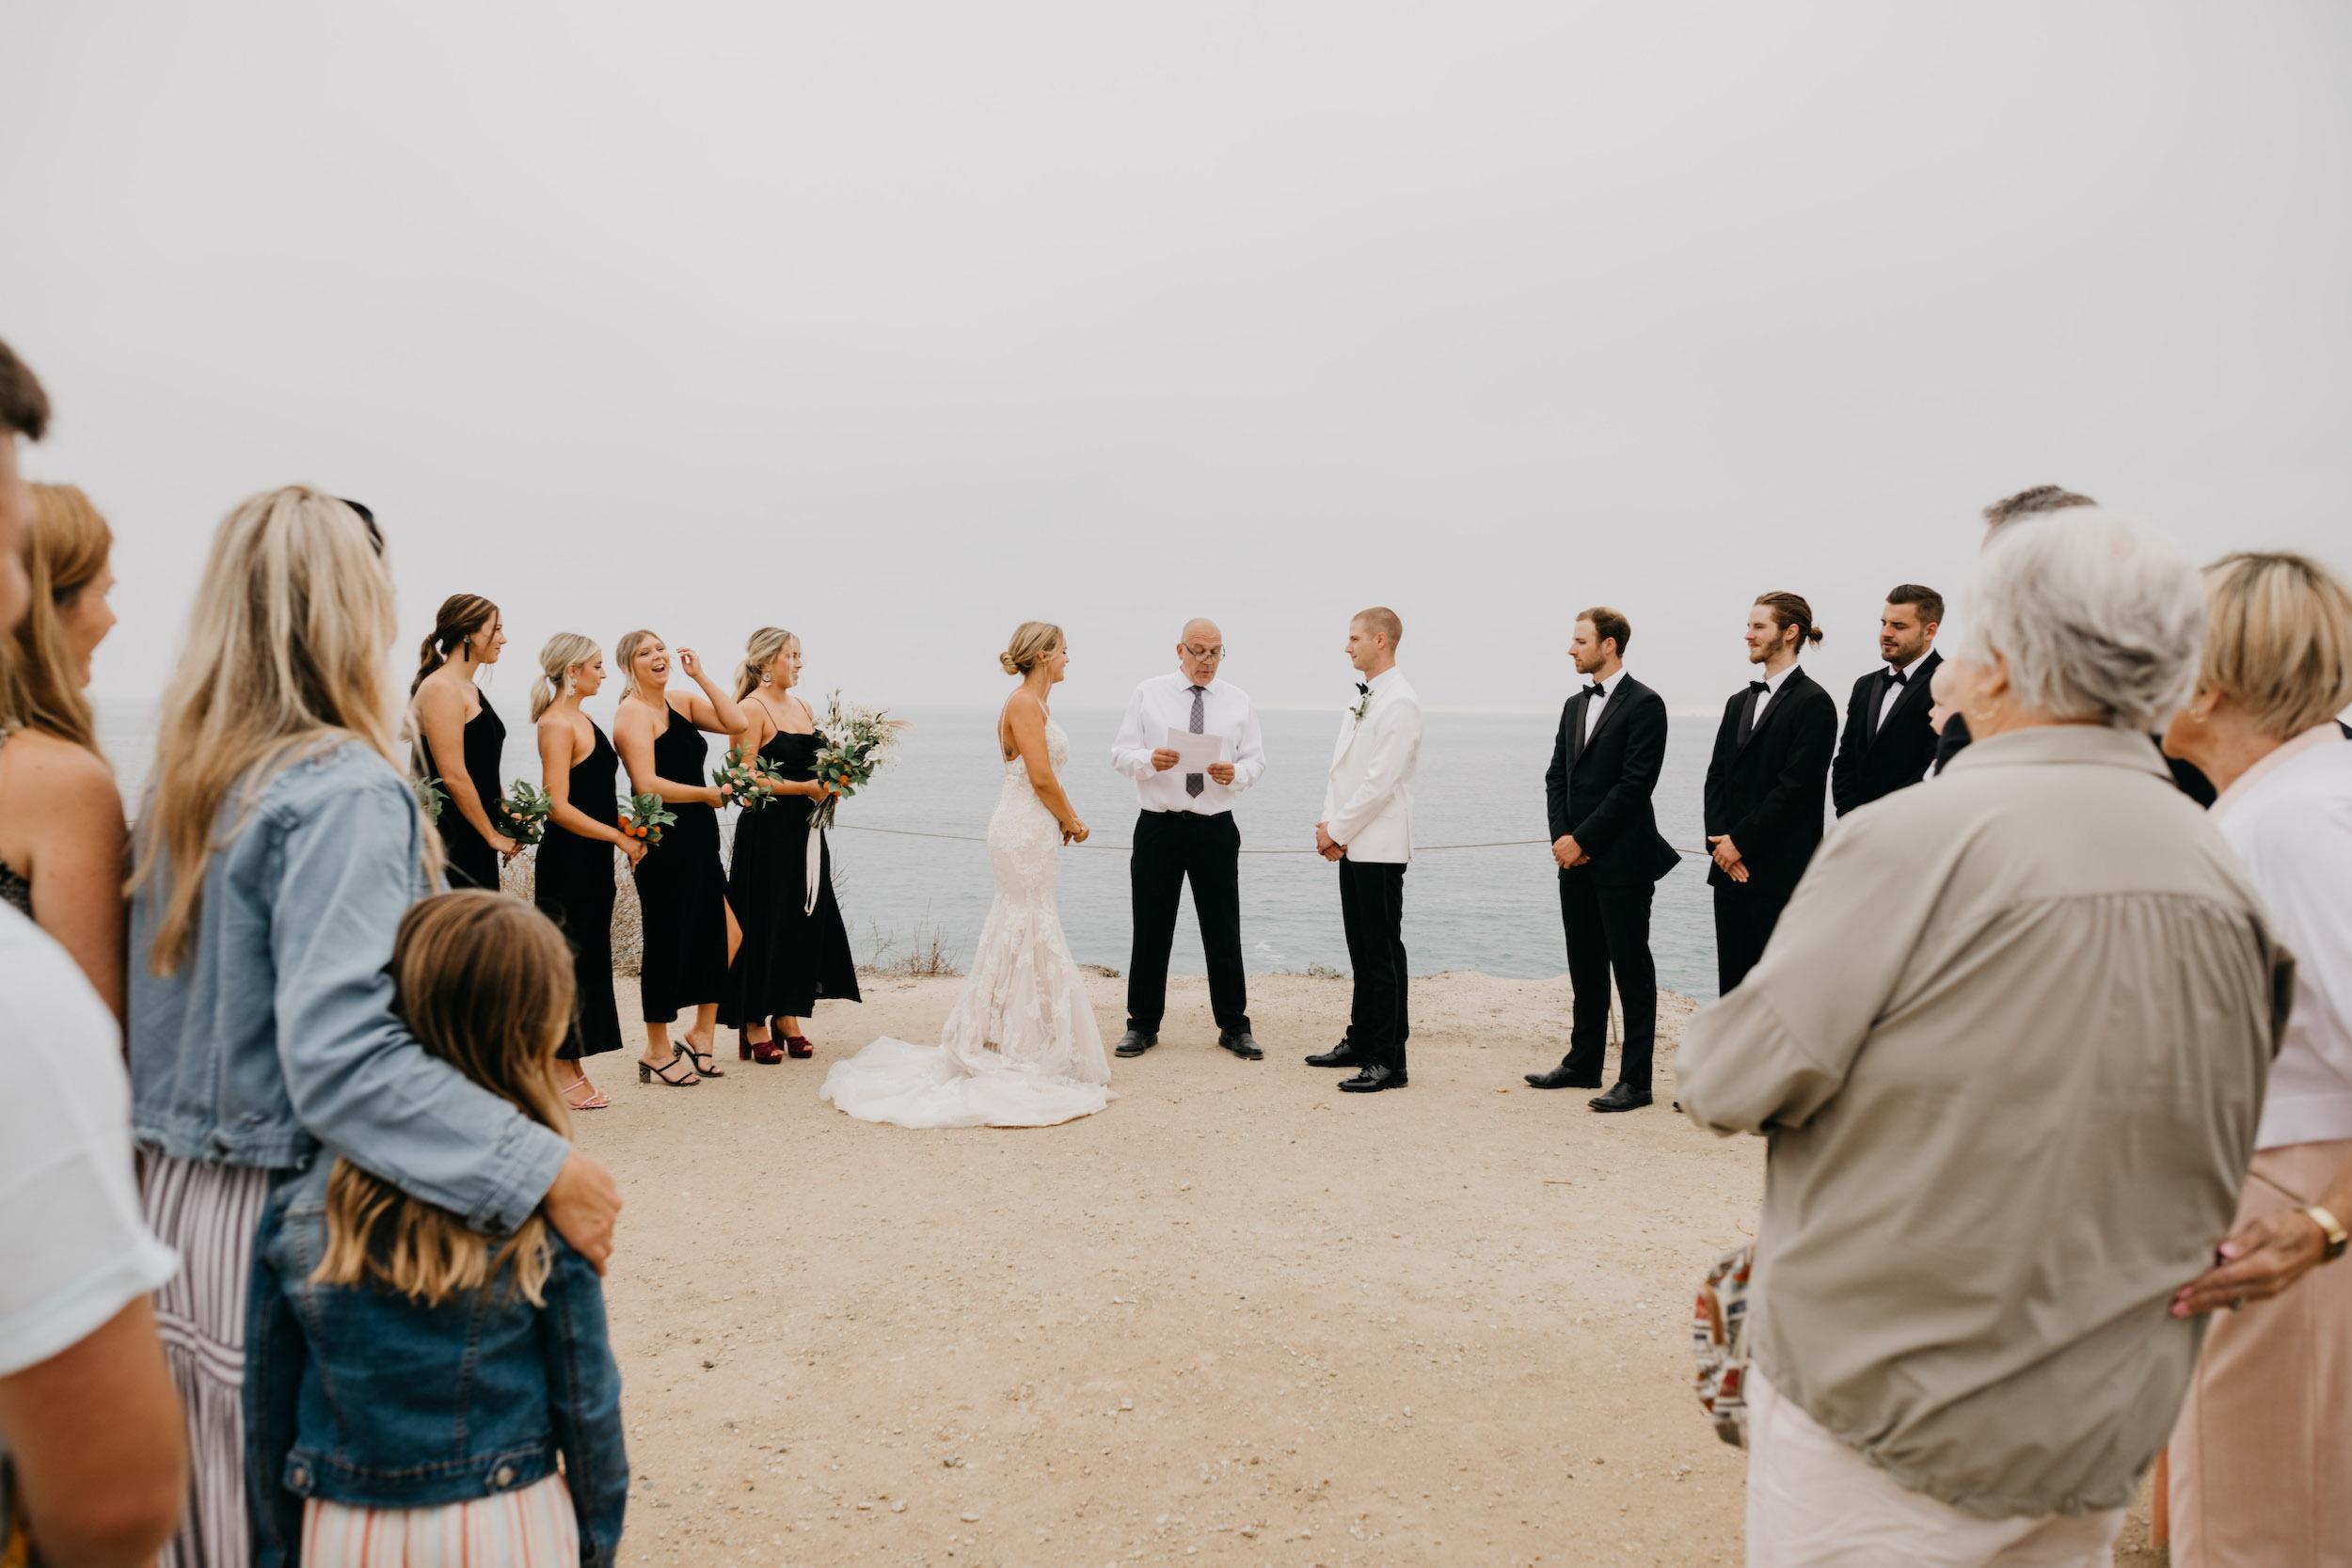 Ceremony in Crystal Cove State Park Wedding in Laguna Beach, image by Fatima Elreda Photo